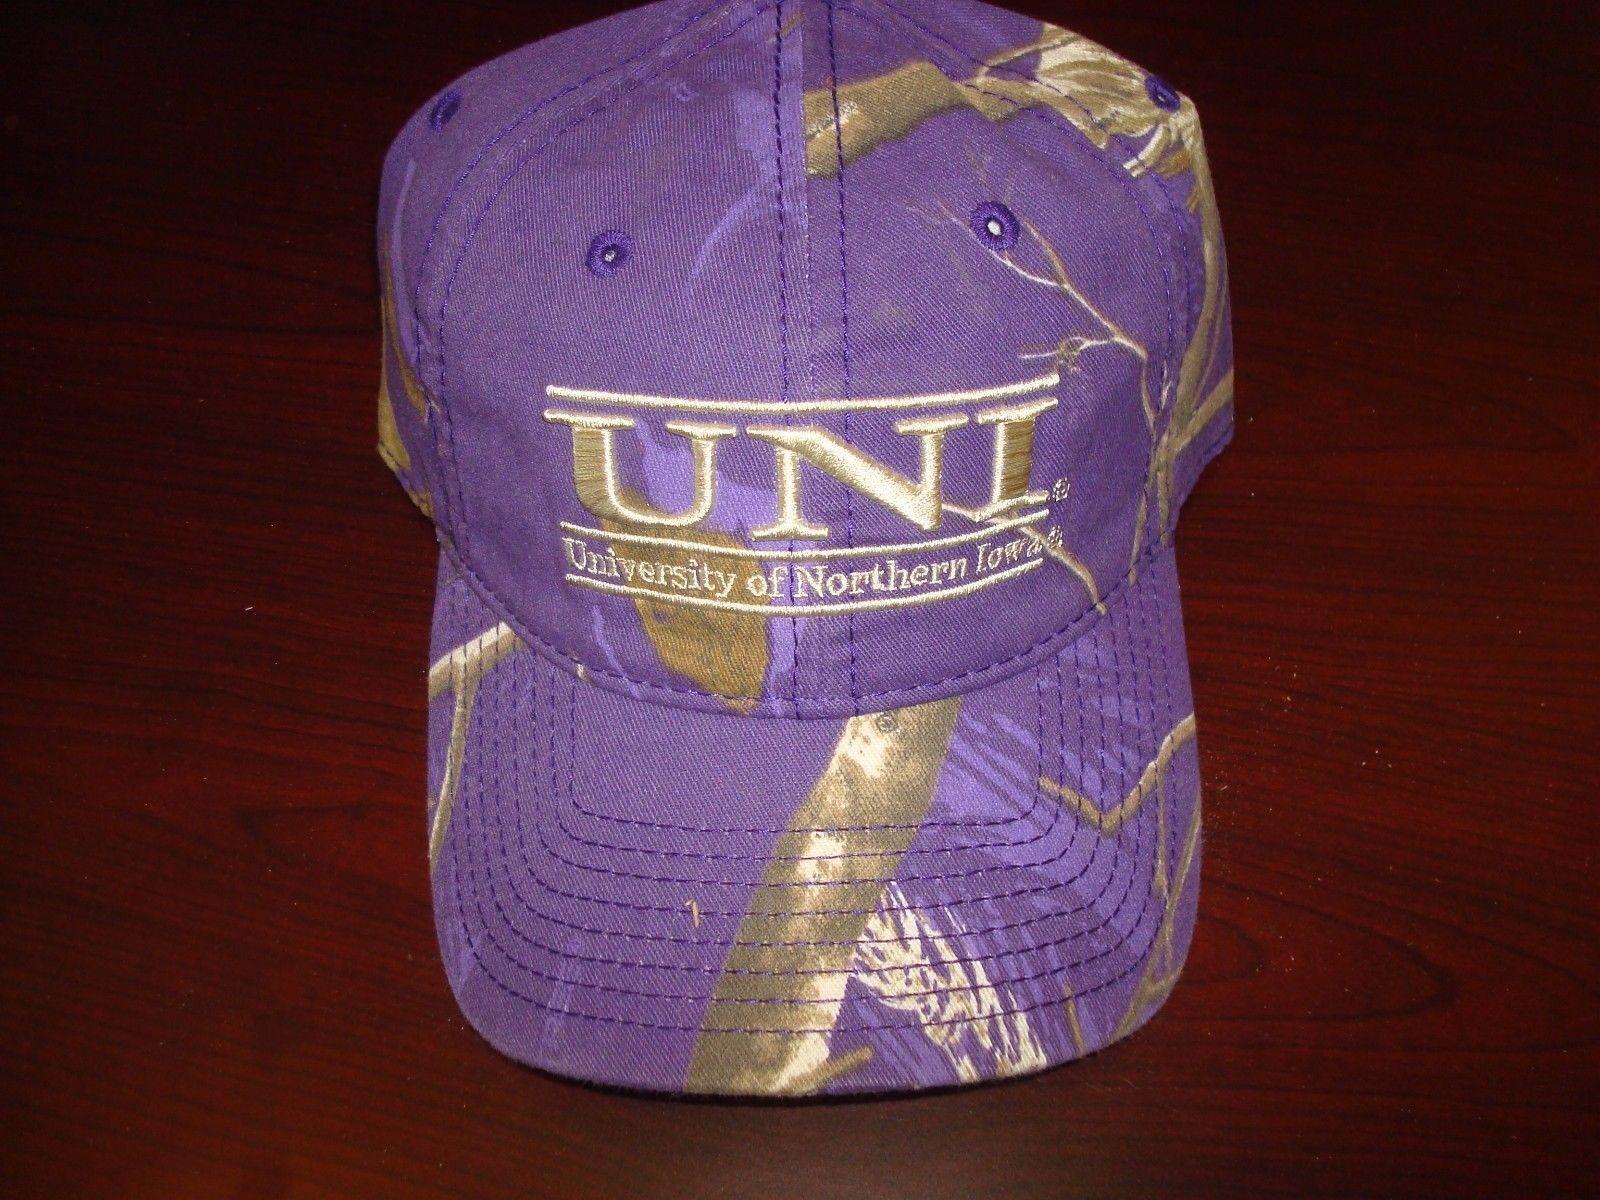 NORTHERN IOWA GAME -UNI-purple camo  THE GAME IOWA  HAT CAP ADJUSTABLE STRAP BACK 0f9908